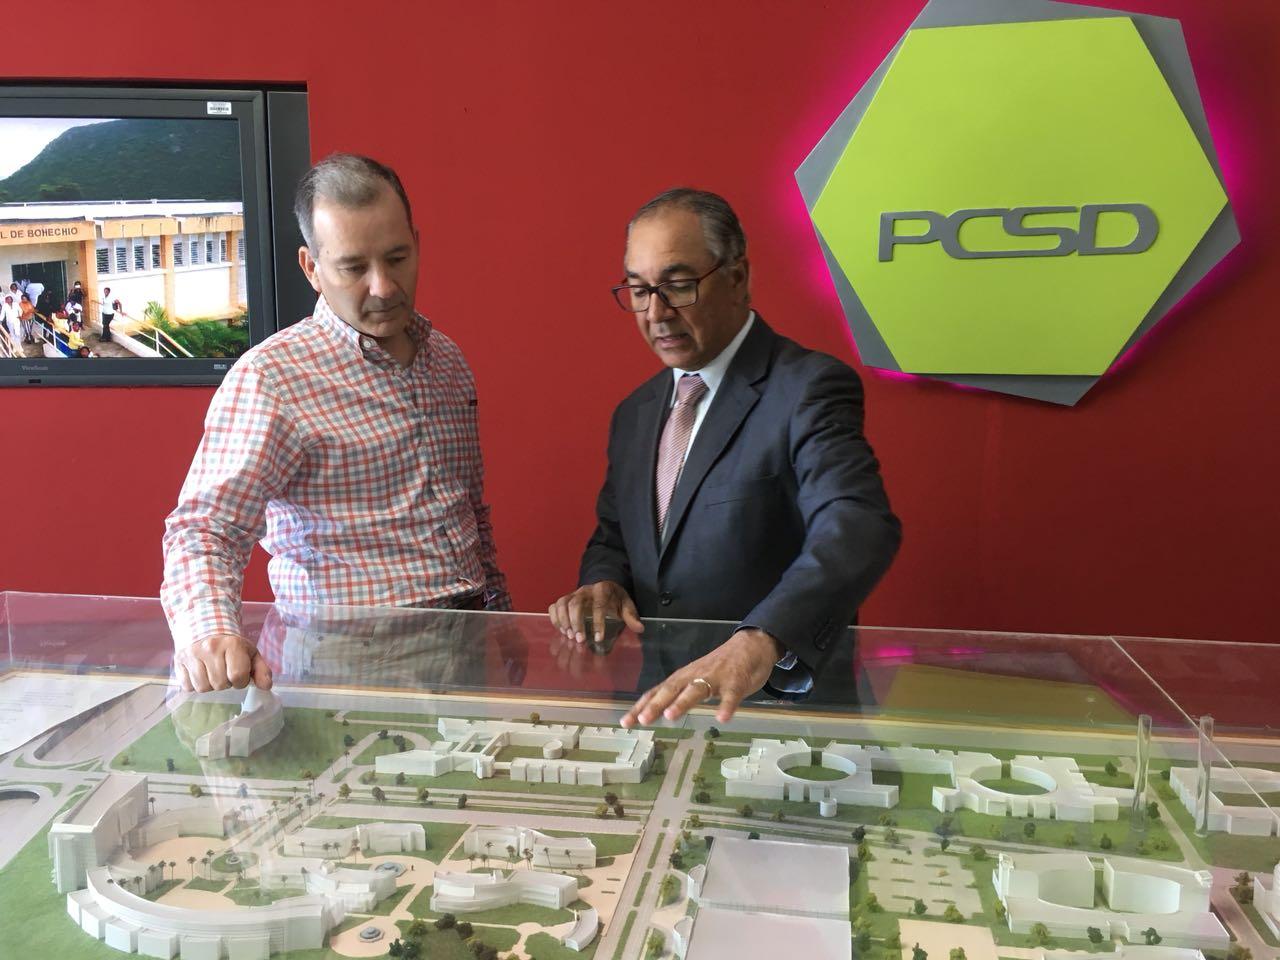 Visita Representante del BID al PCSD 1